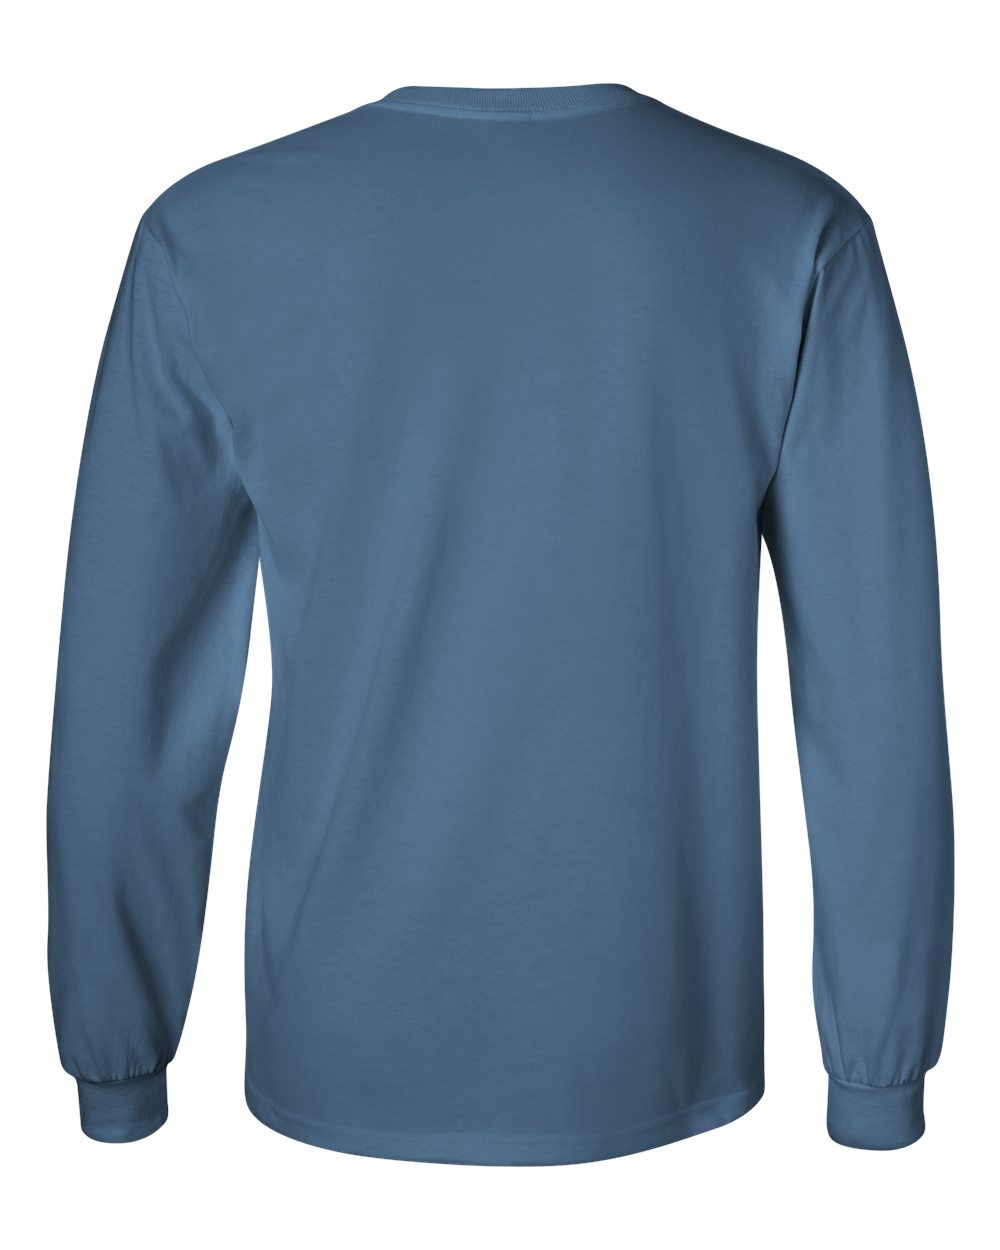 Gildan-Men-039-s-Ultra-Cotton-6-oz-Long-Sleeve-T-Shirt-G240-S-5XL thumbnail 40